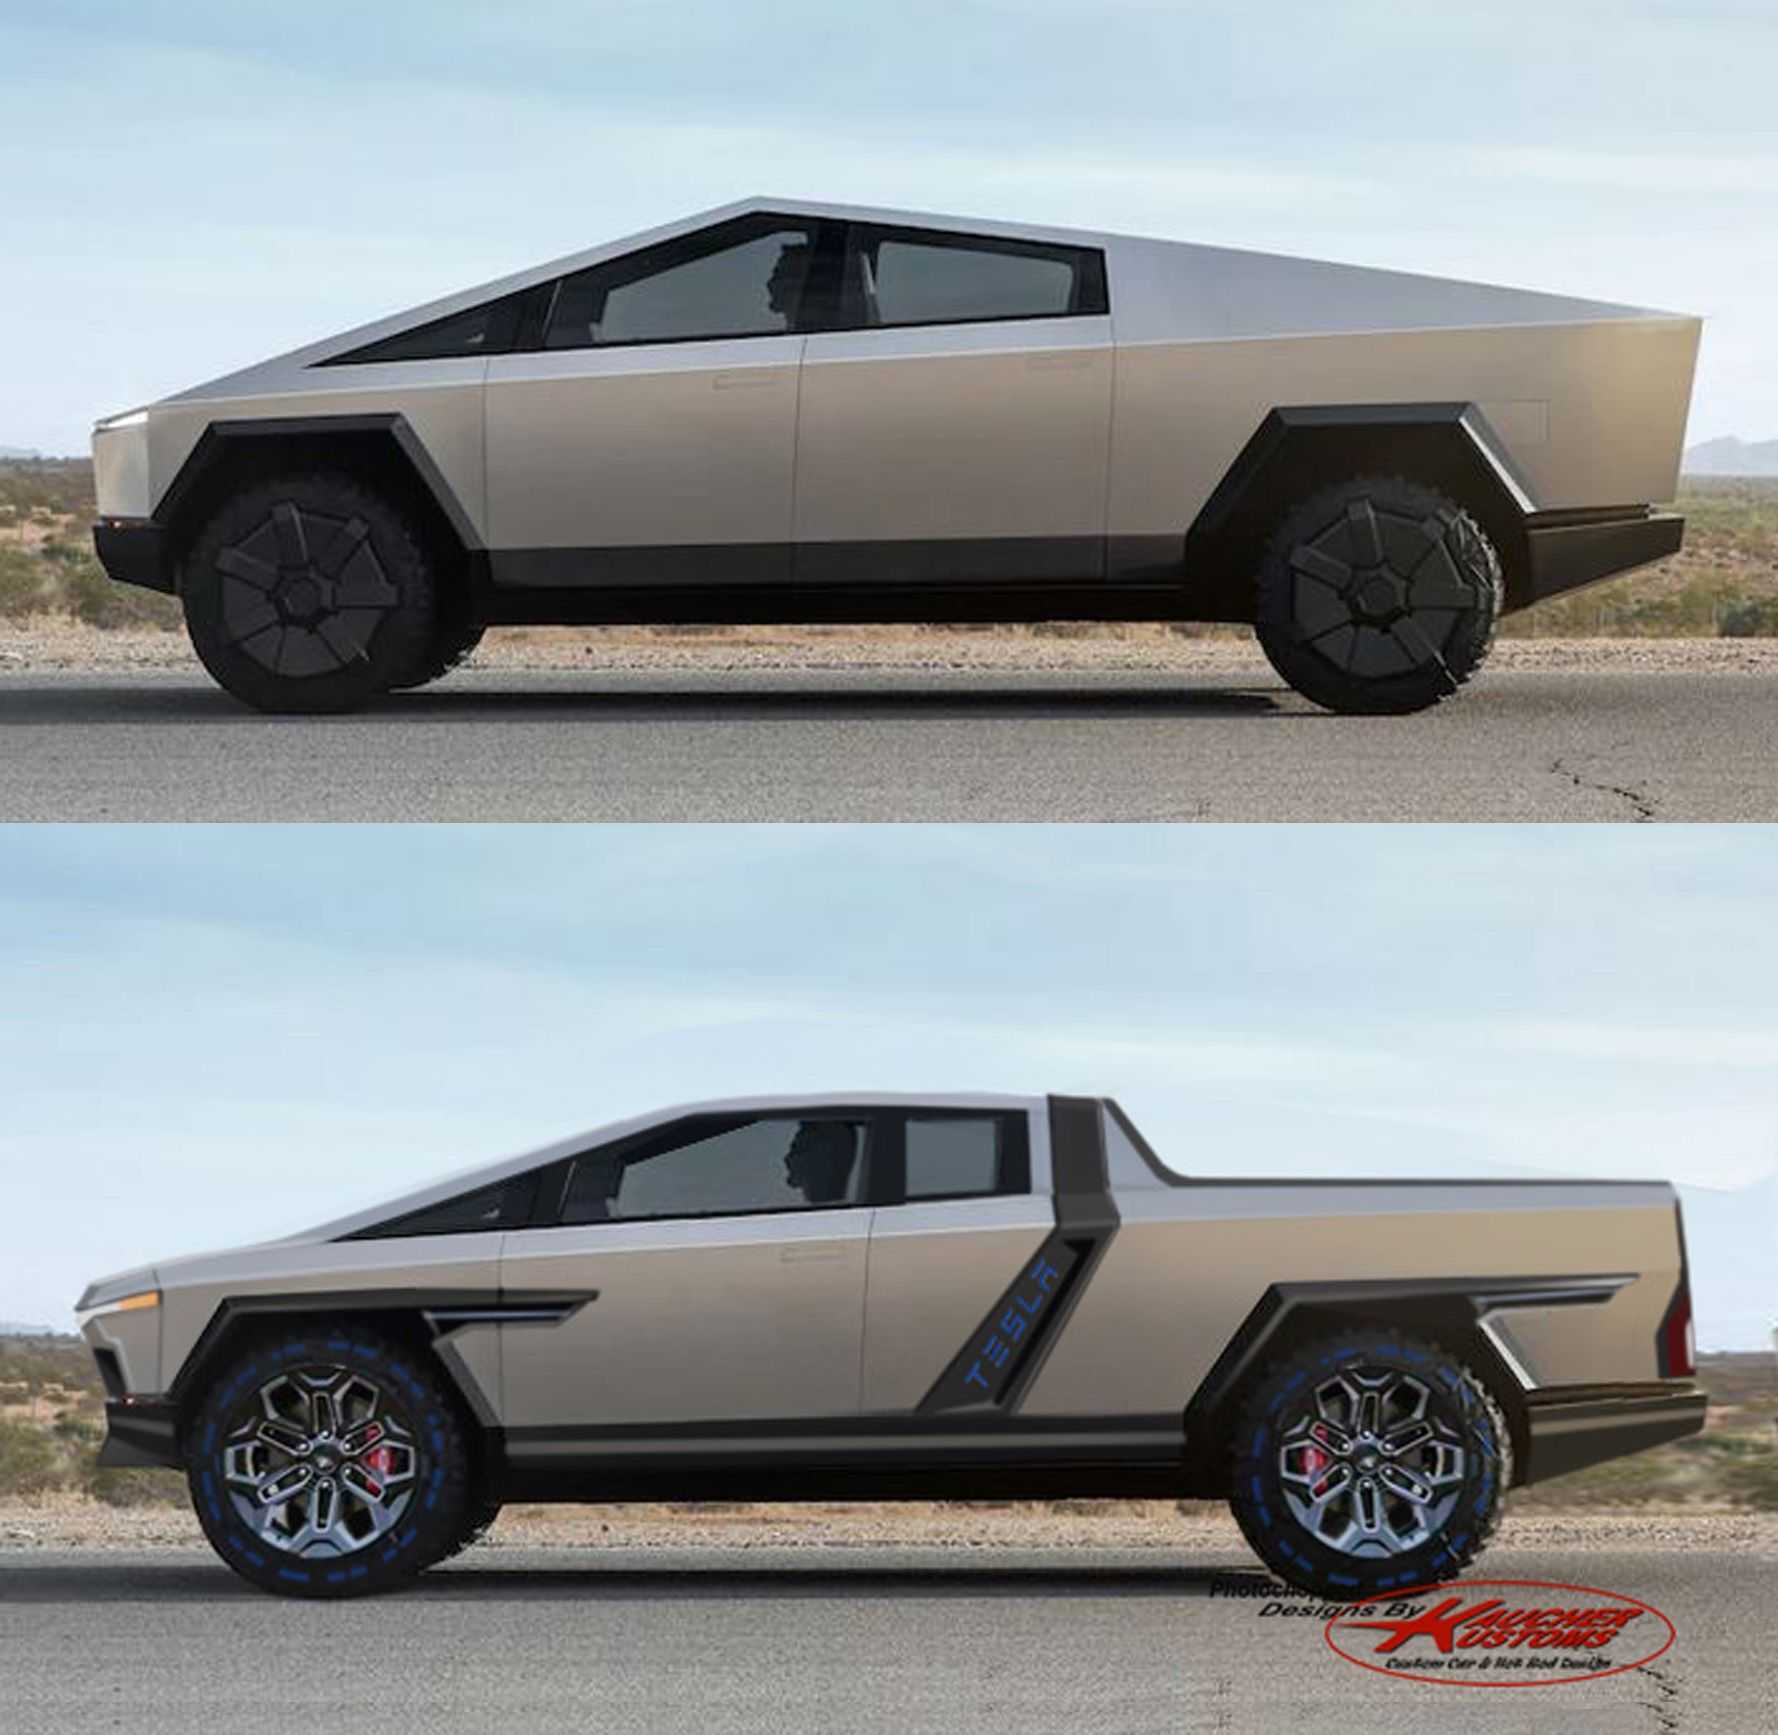 Kaucherkustoms Restyle Of The Tesla Cyber Truck Tesla Tesla Car Custom Cars